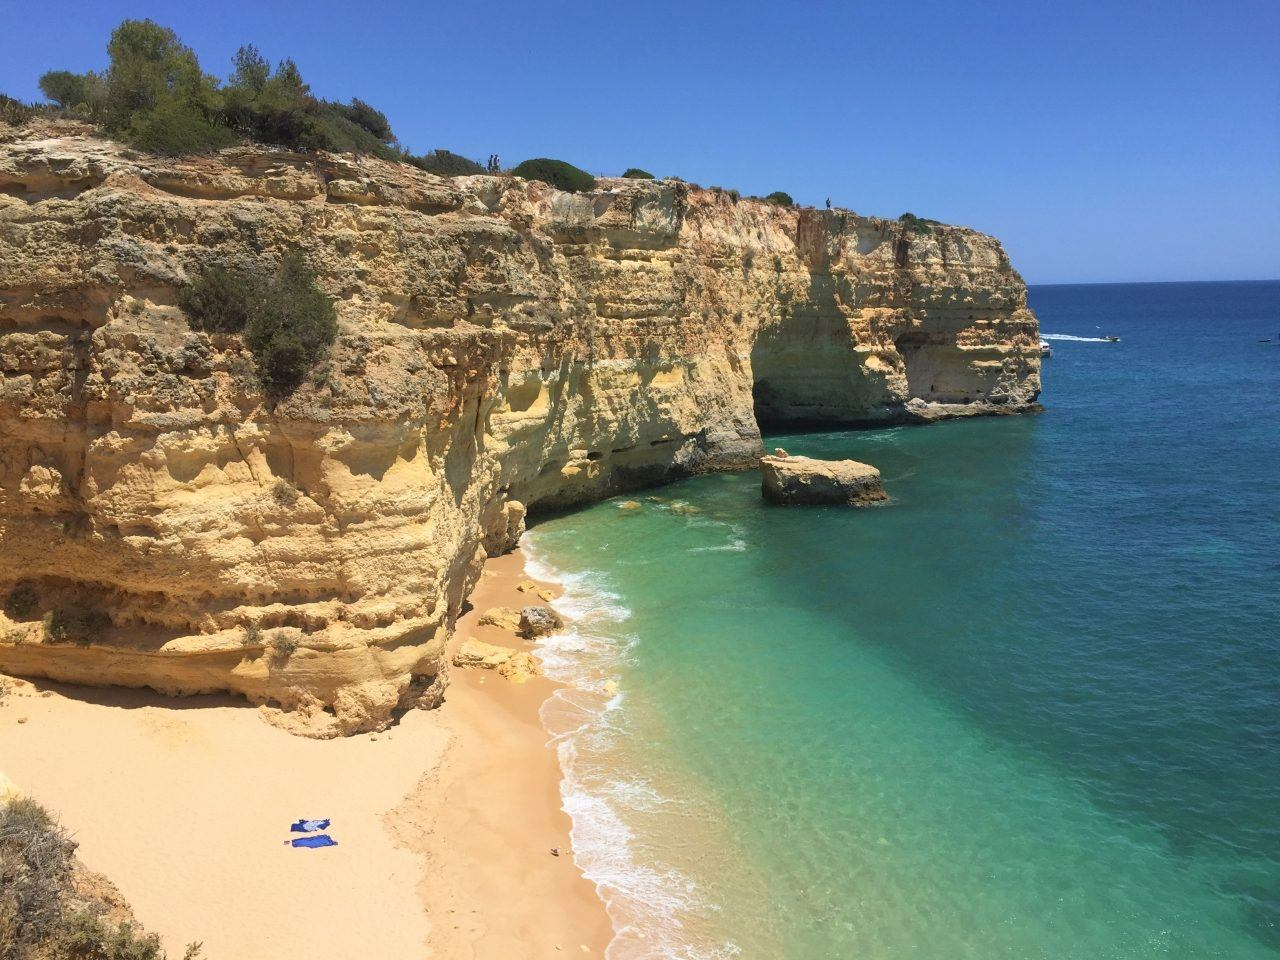 Algarve rock wall and beach